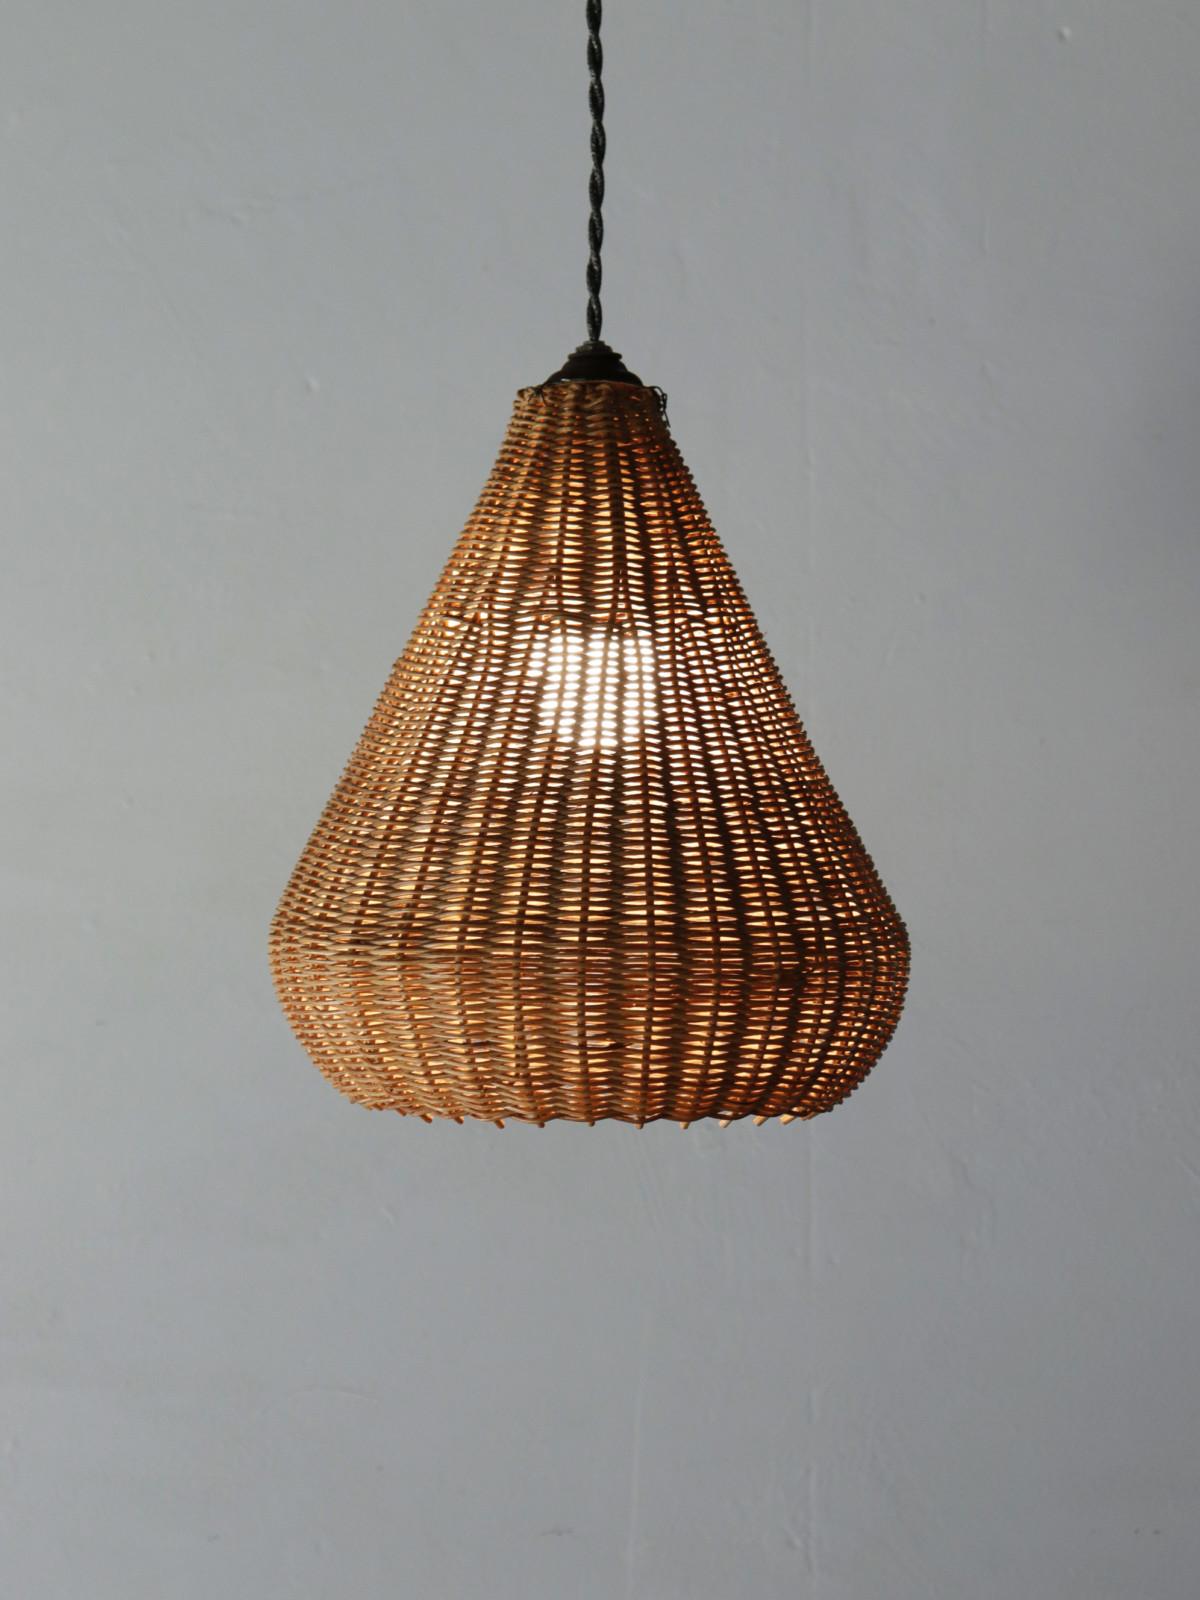 Wicker lamp shade,mcm,USA,